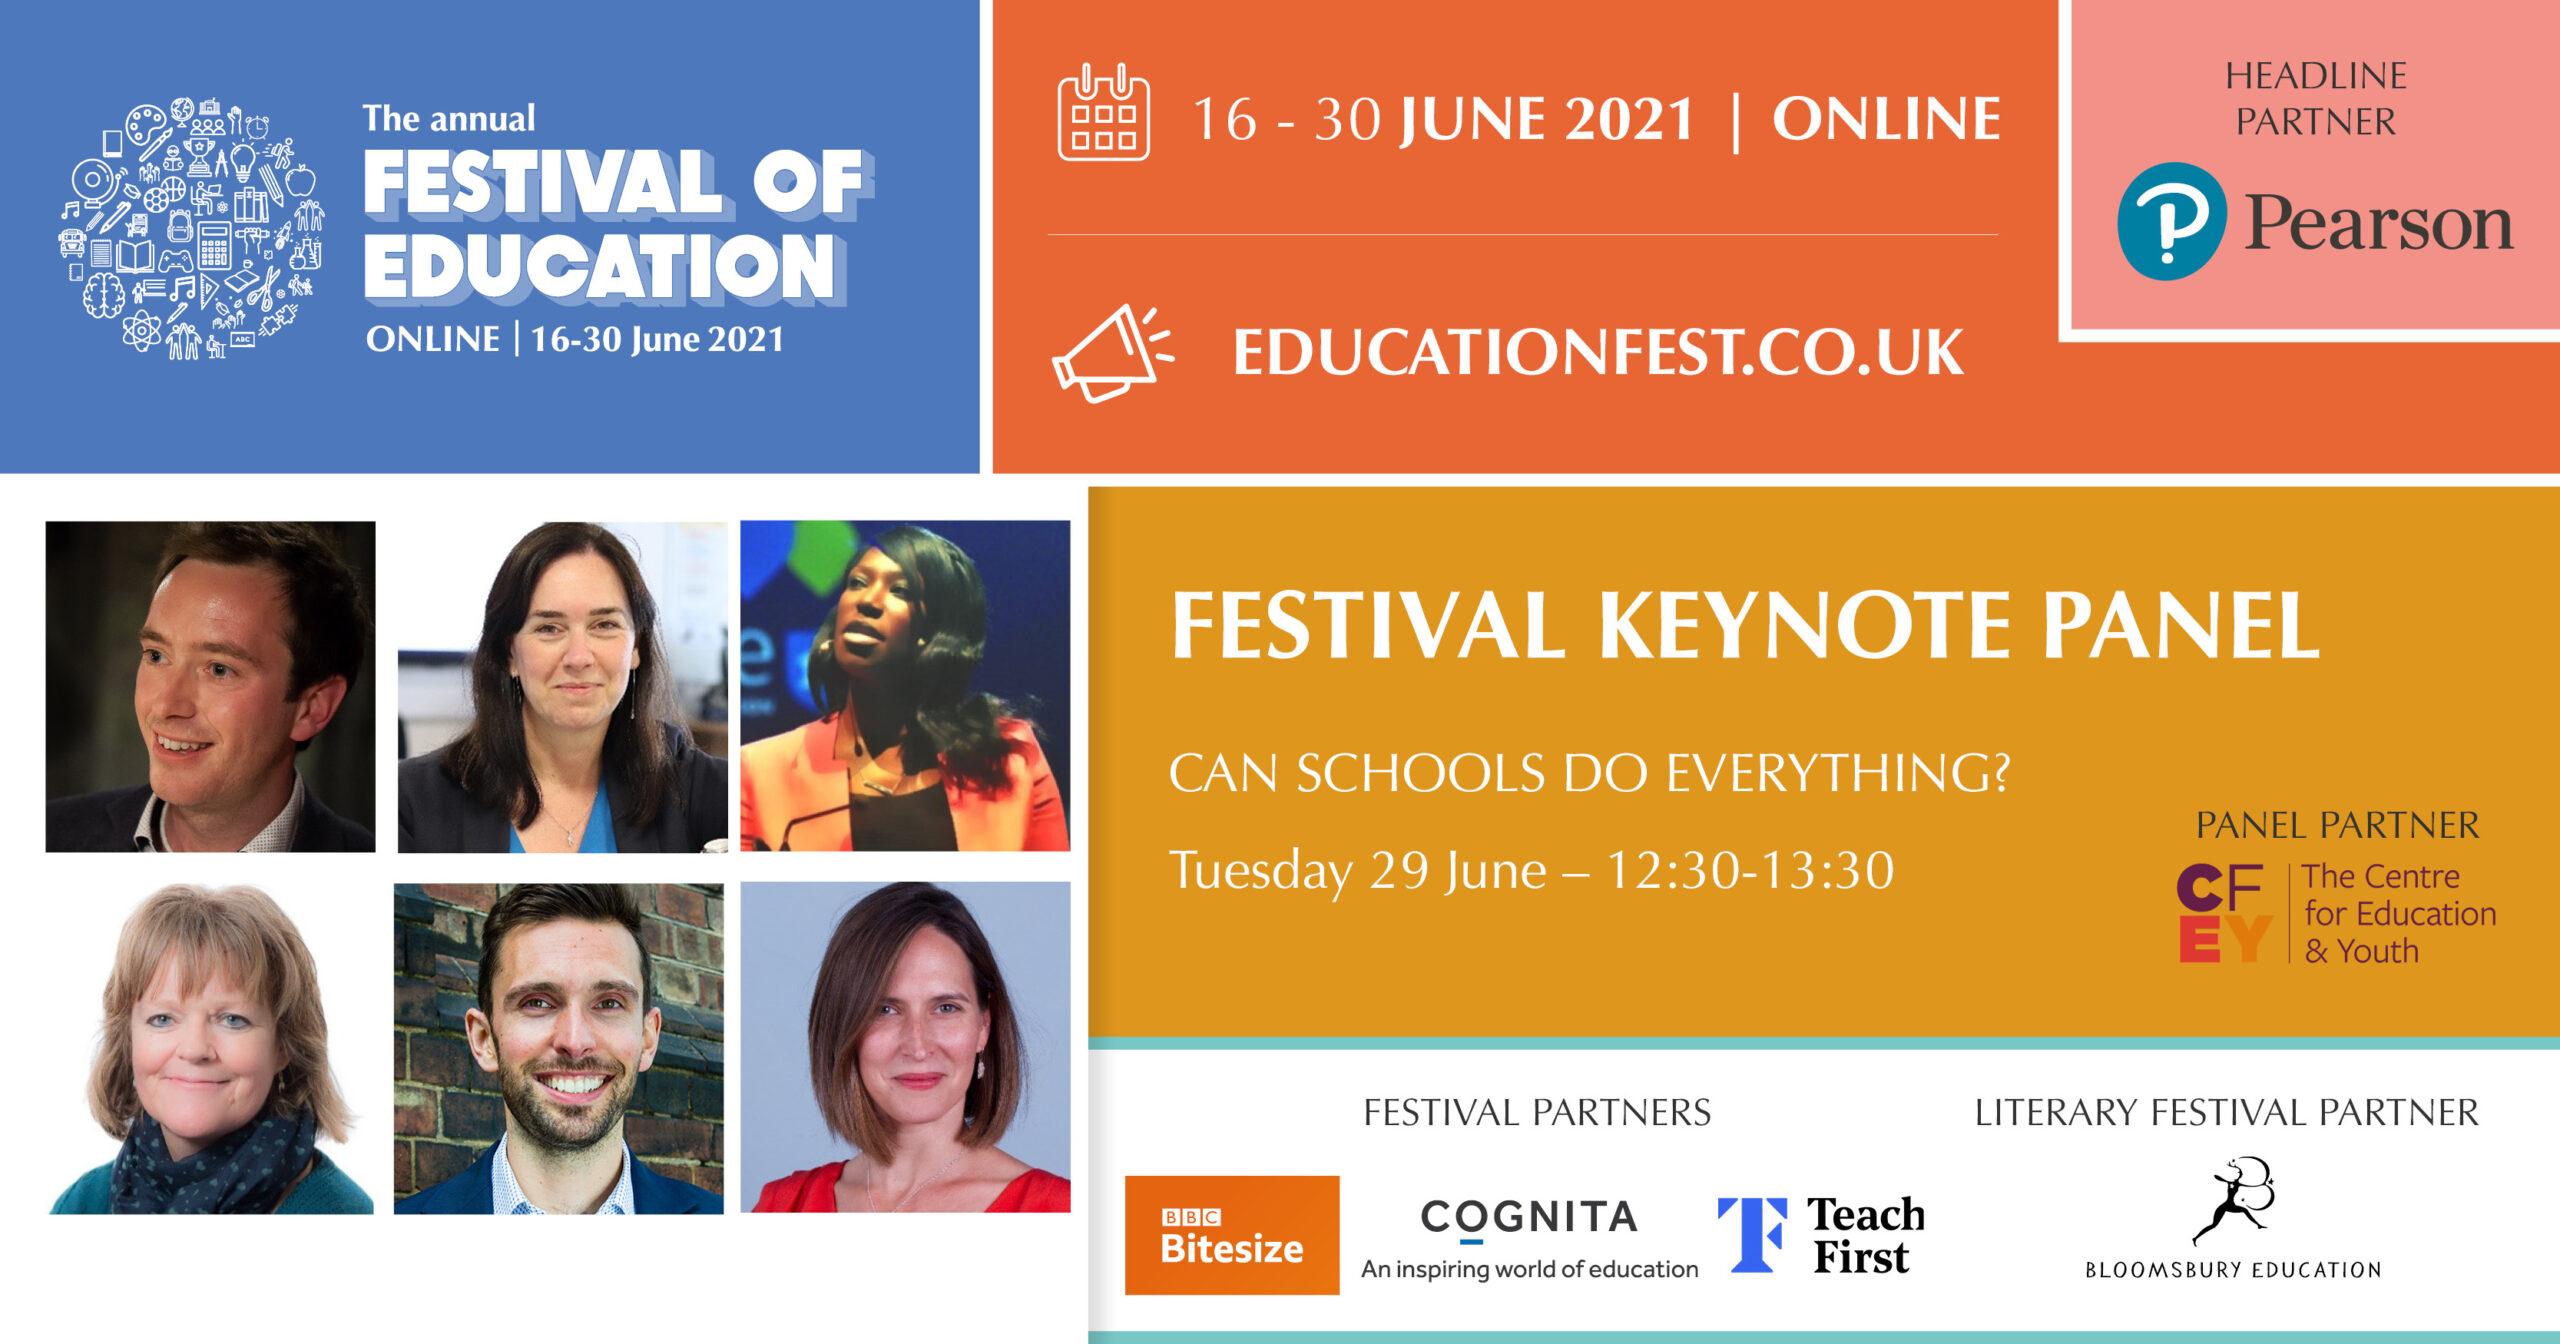 Festival of Education